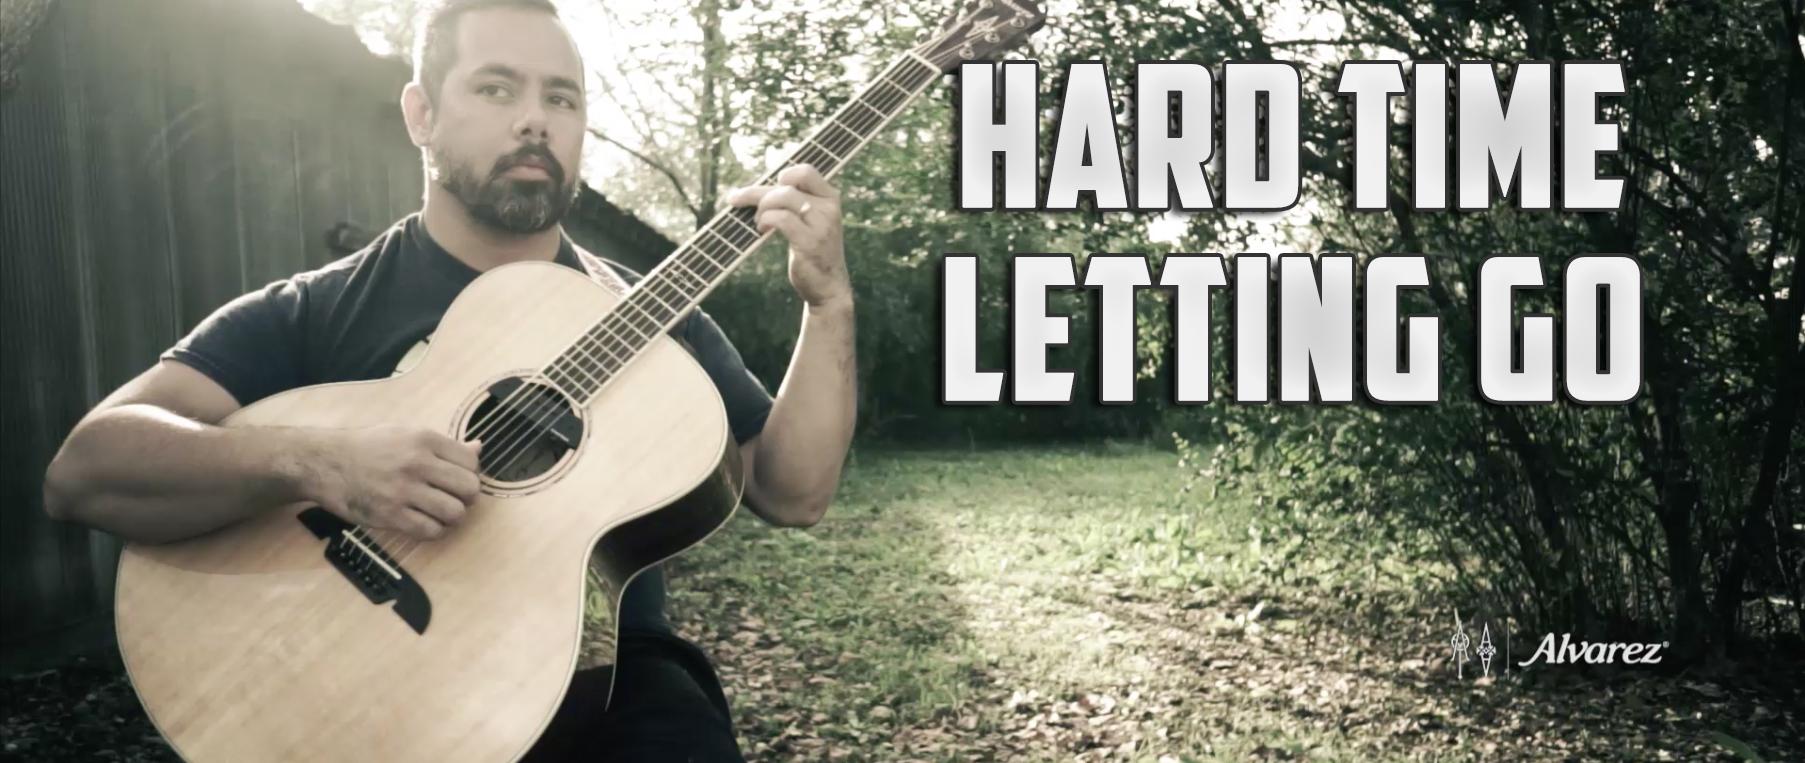 Tony Murnahan - Hard Time Letting Go